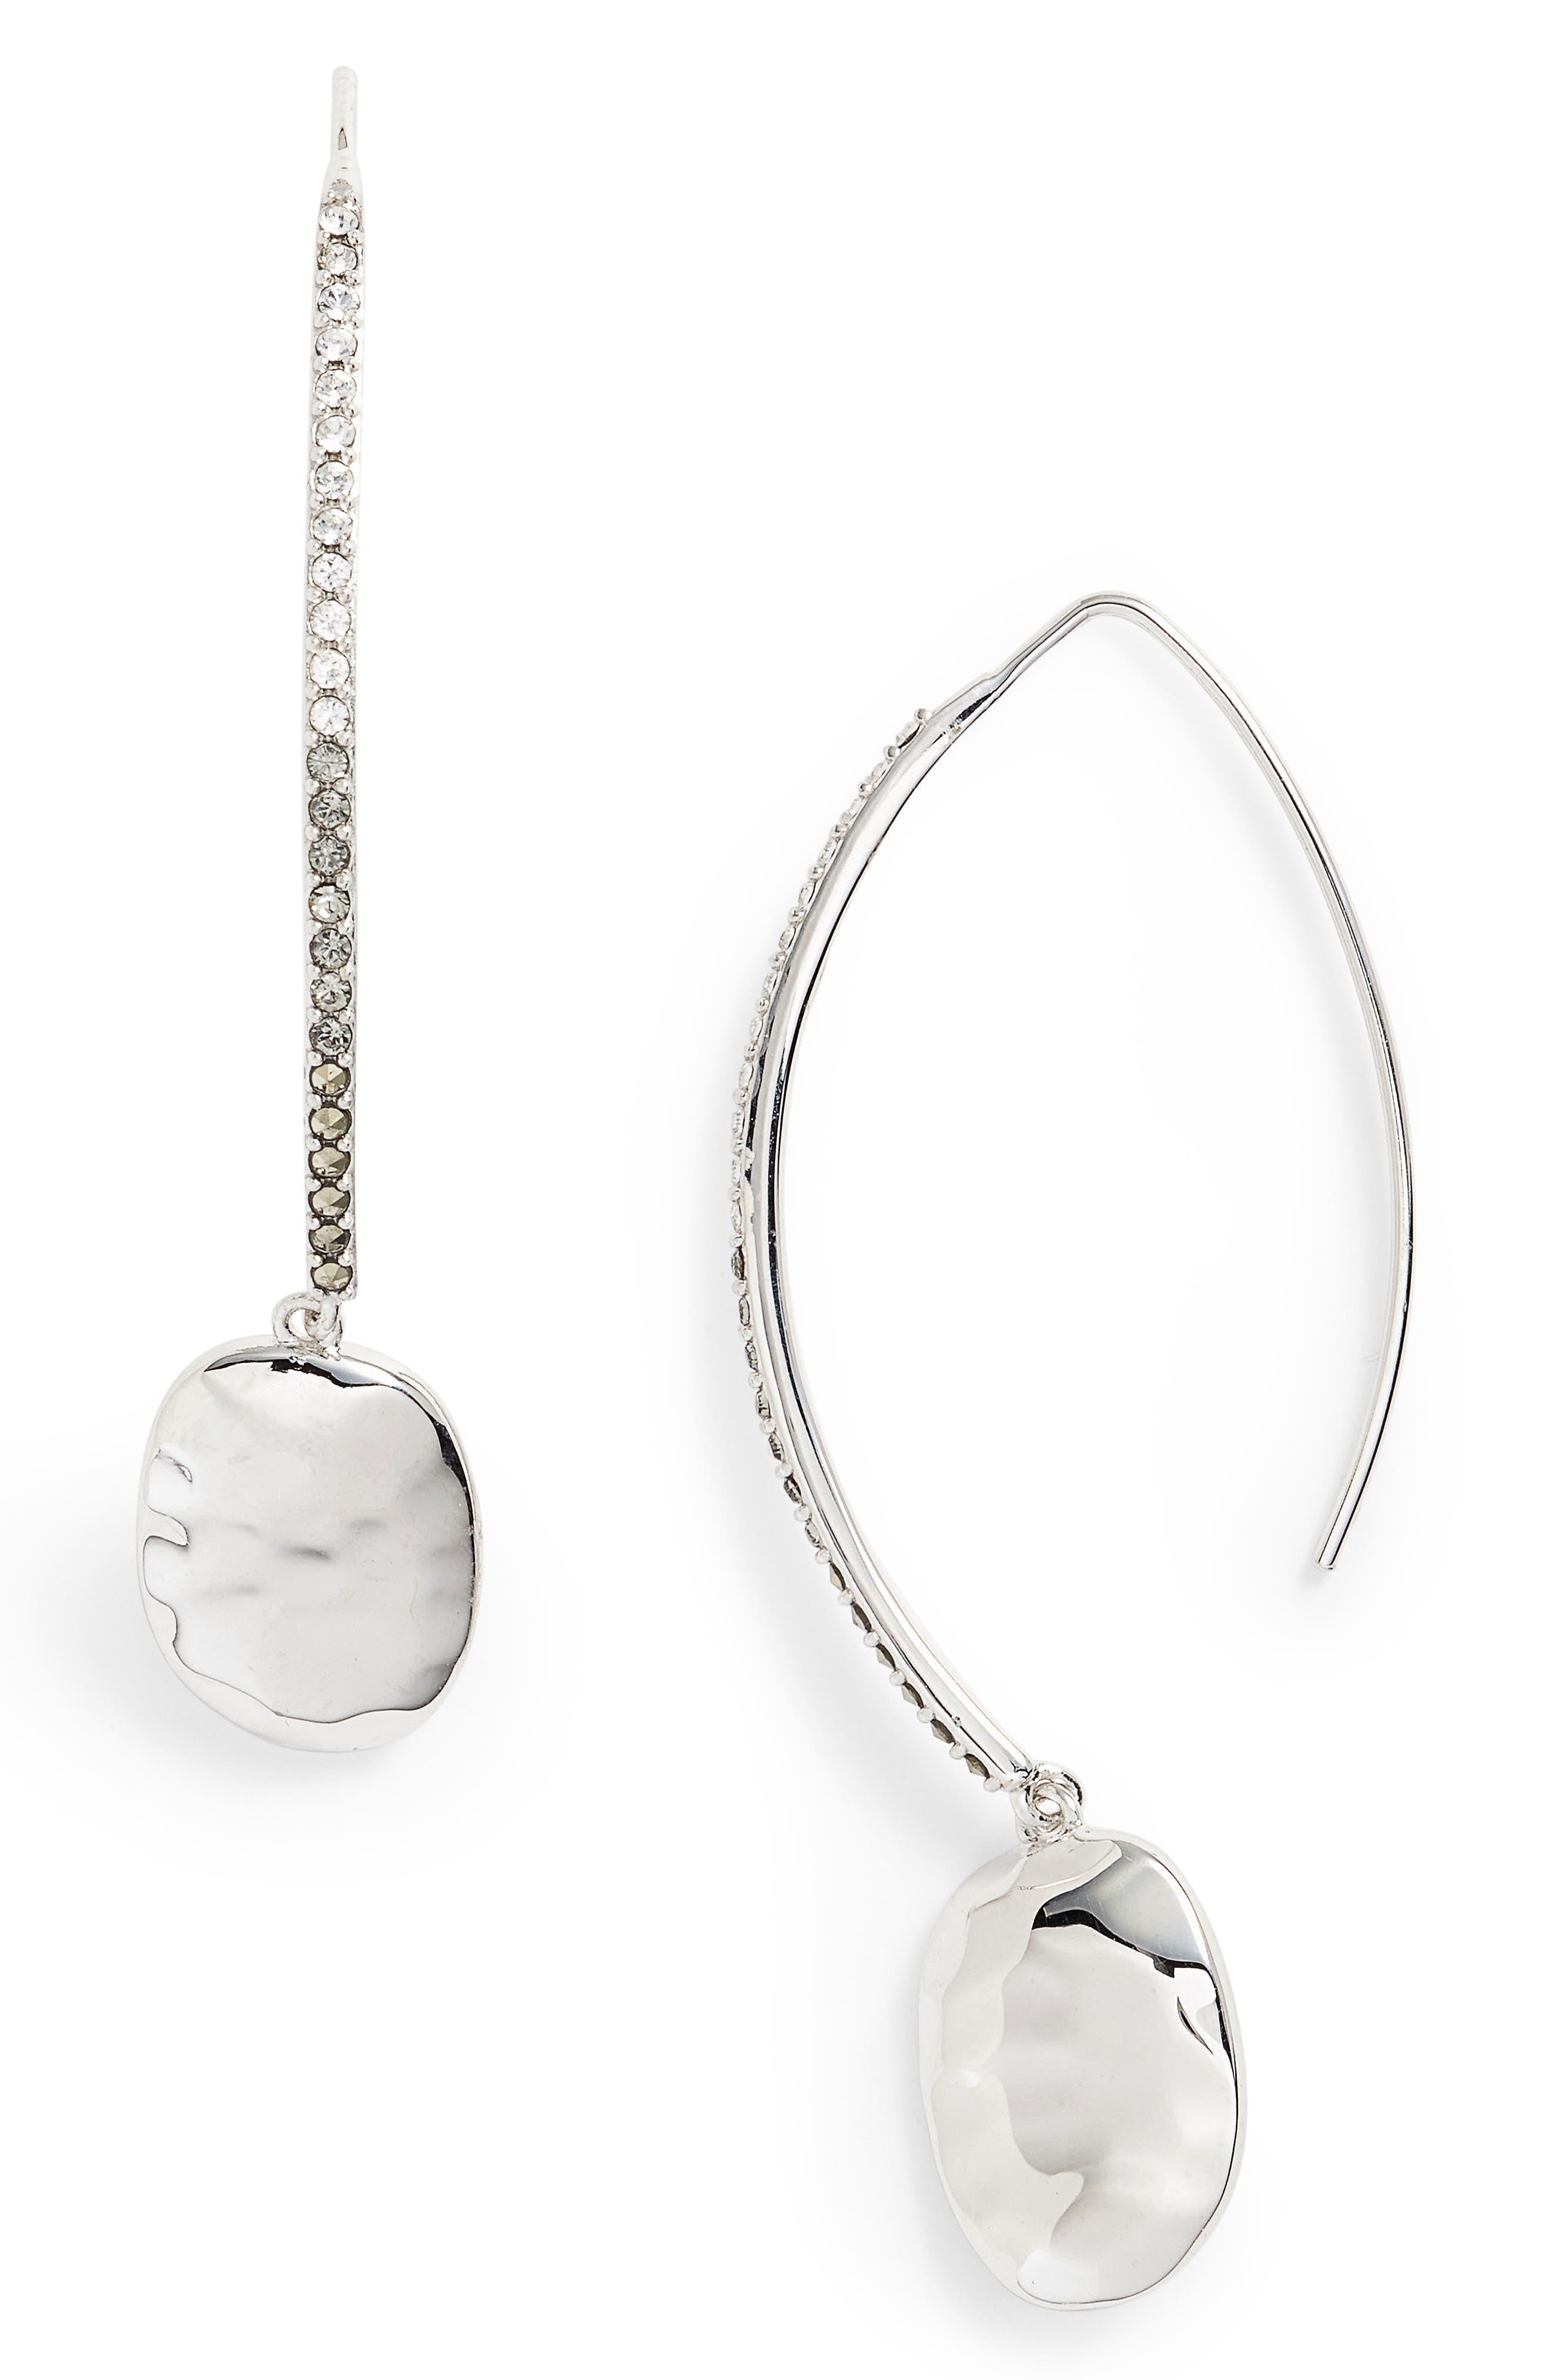 Judith Jack Threader Drop Earrings